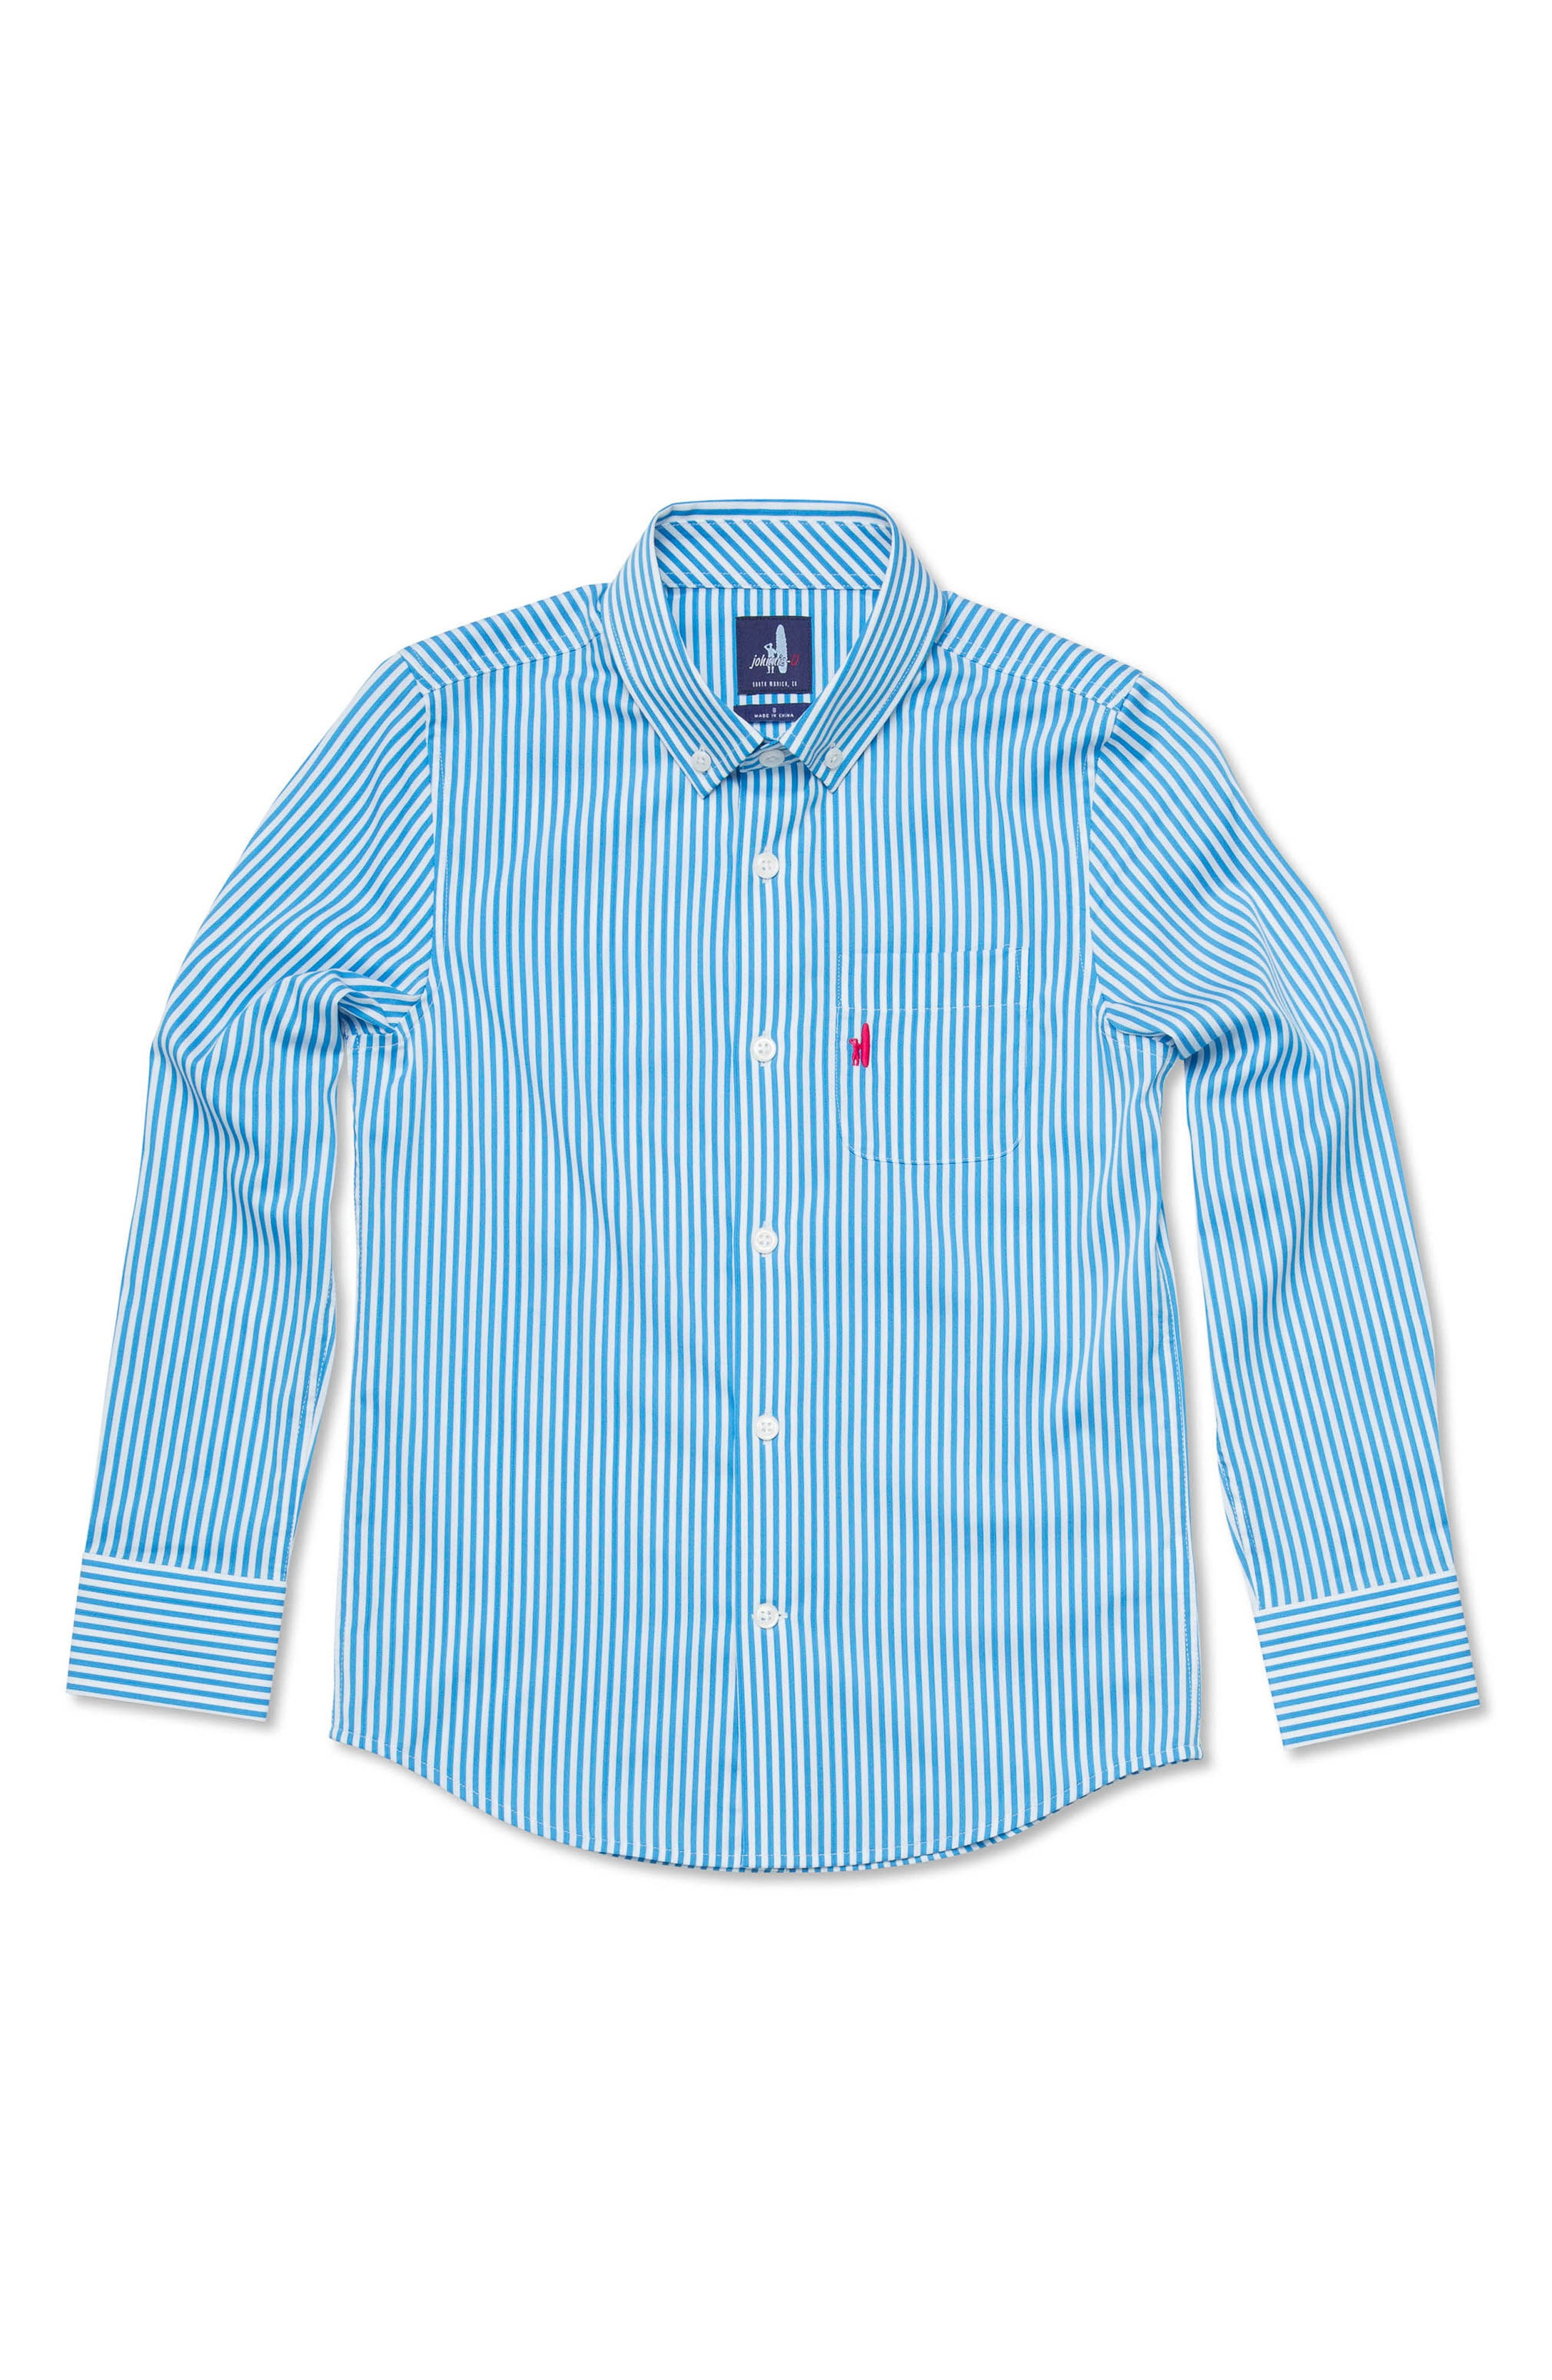 Nole Striped Dress Shirt,                             Main thumbnail 1, color,                             465